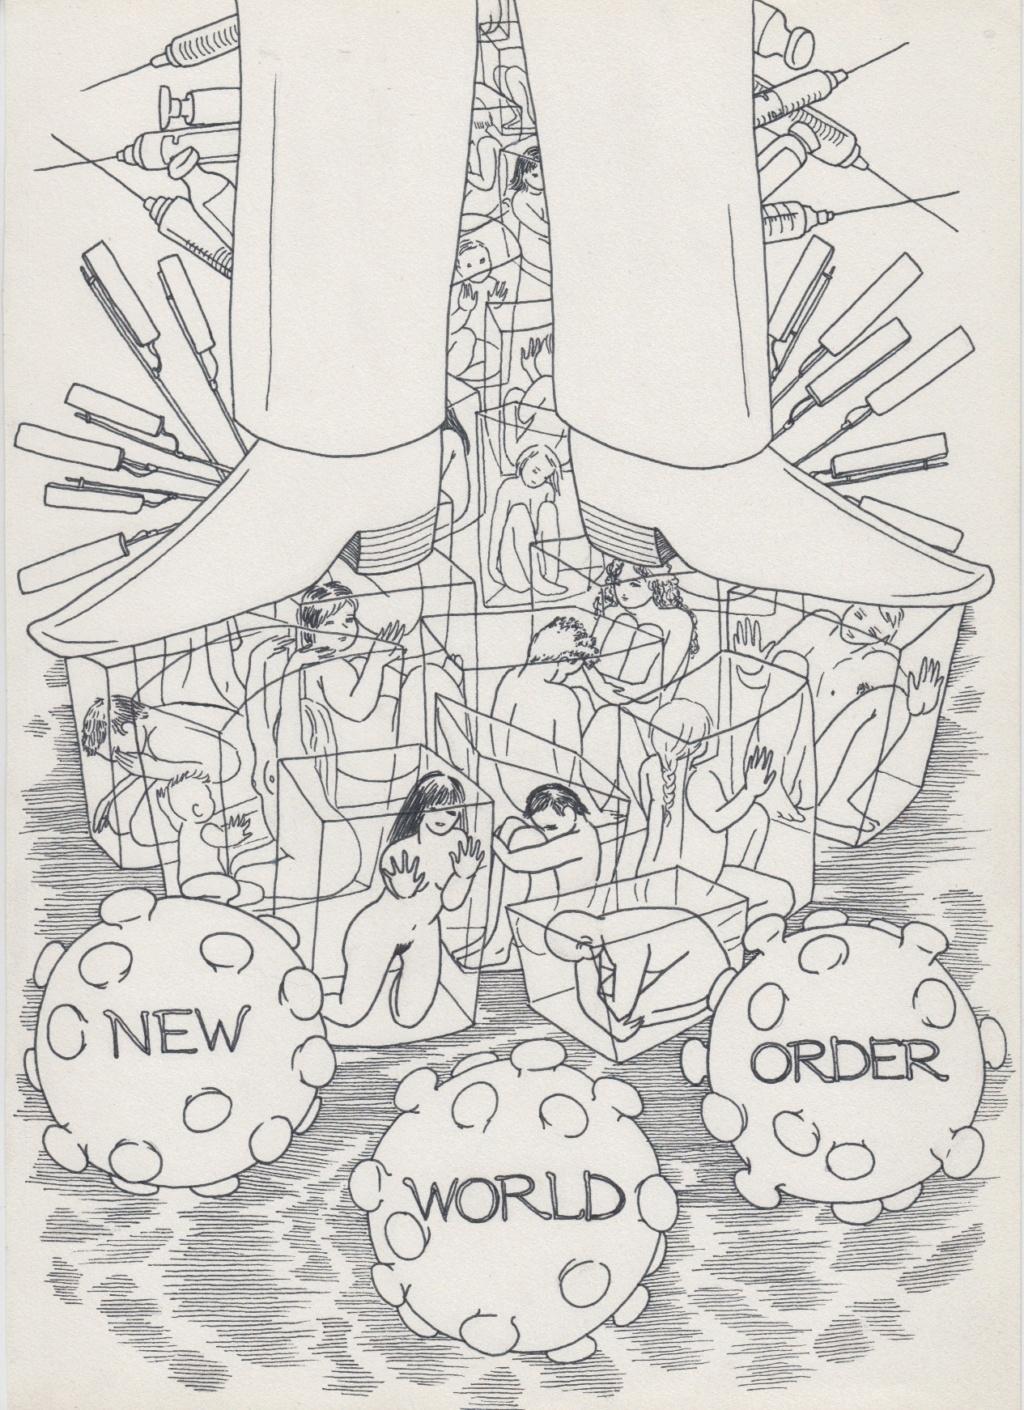 Flat Earth/Conspiracy Raw Drawings Scan110